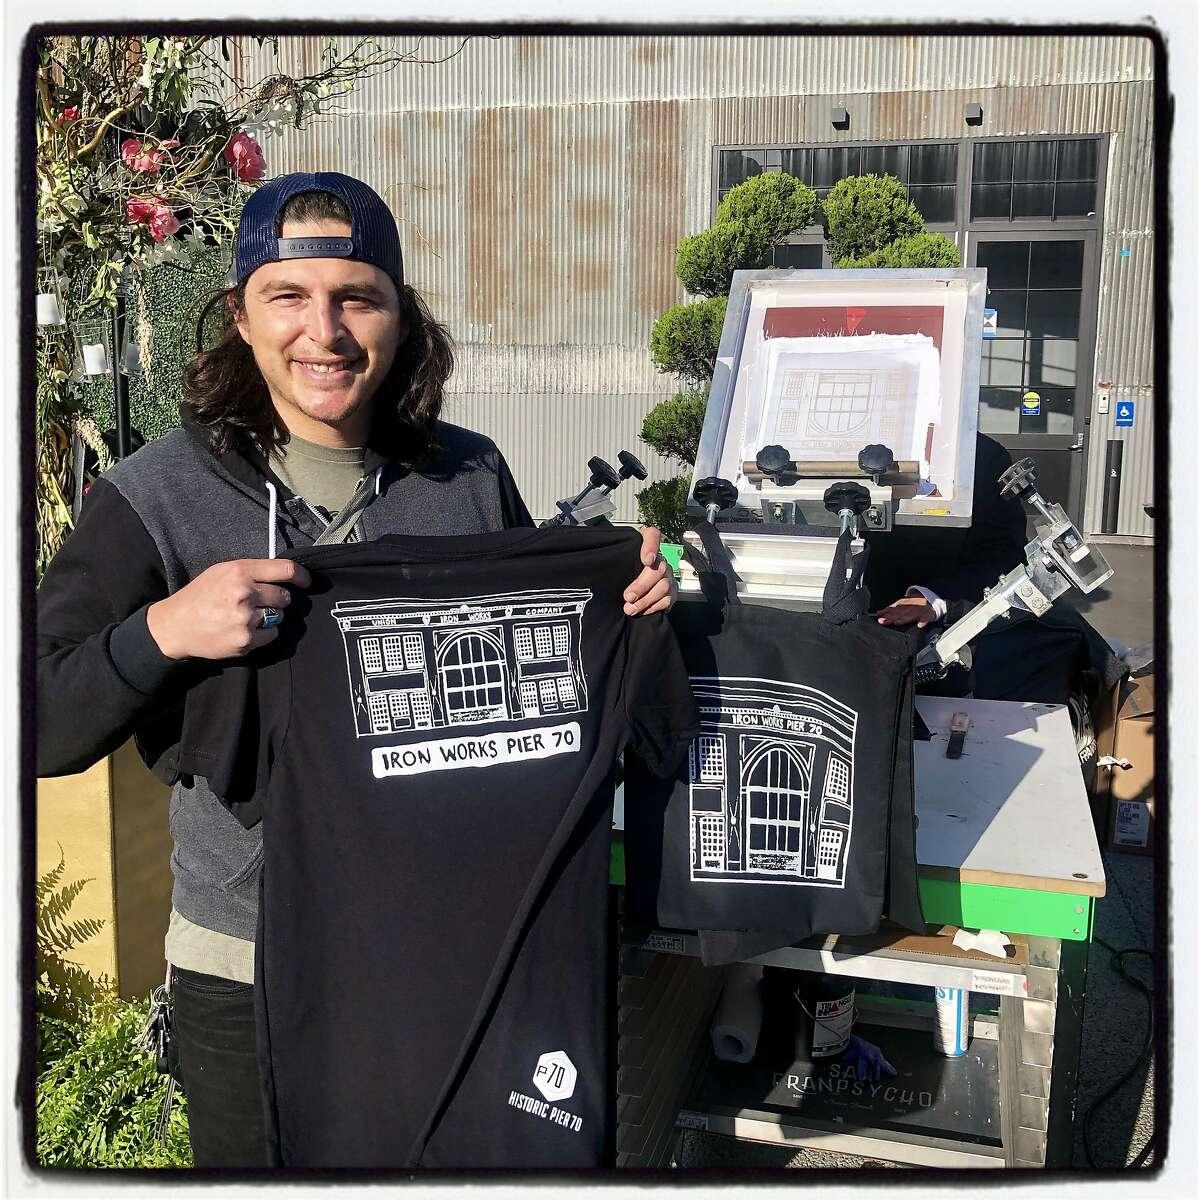 San Franpyscho cofounder Christian Routzen live prints T-shirts at Pier 70. May 29, 2019.